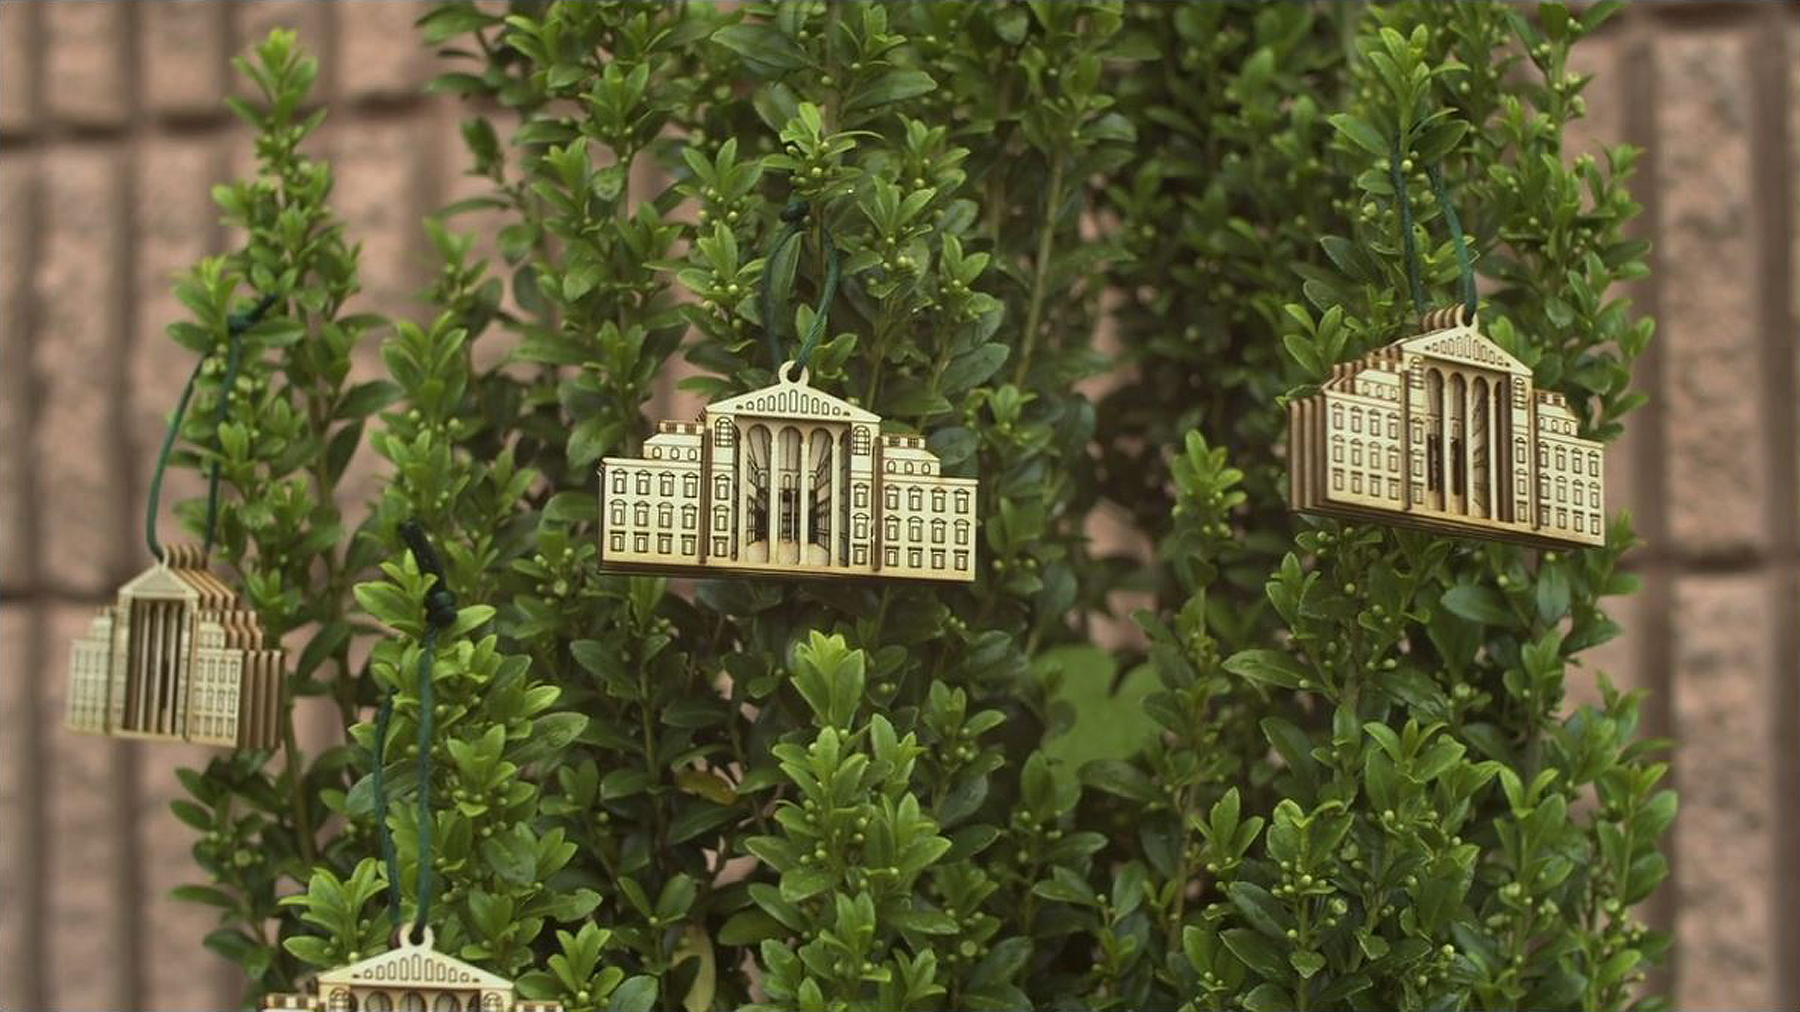 NBM Ornament On A Tree2